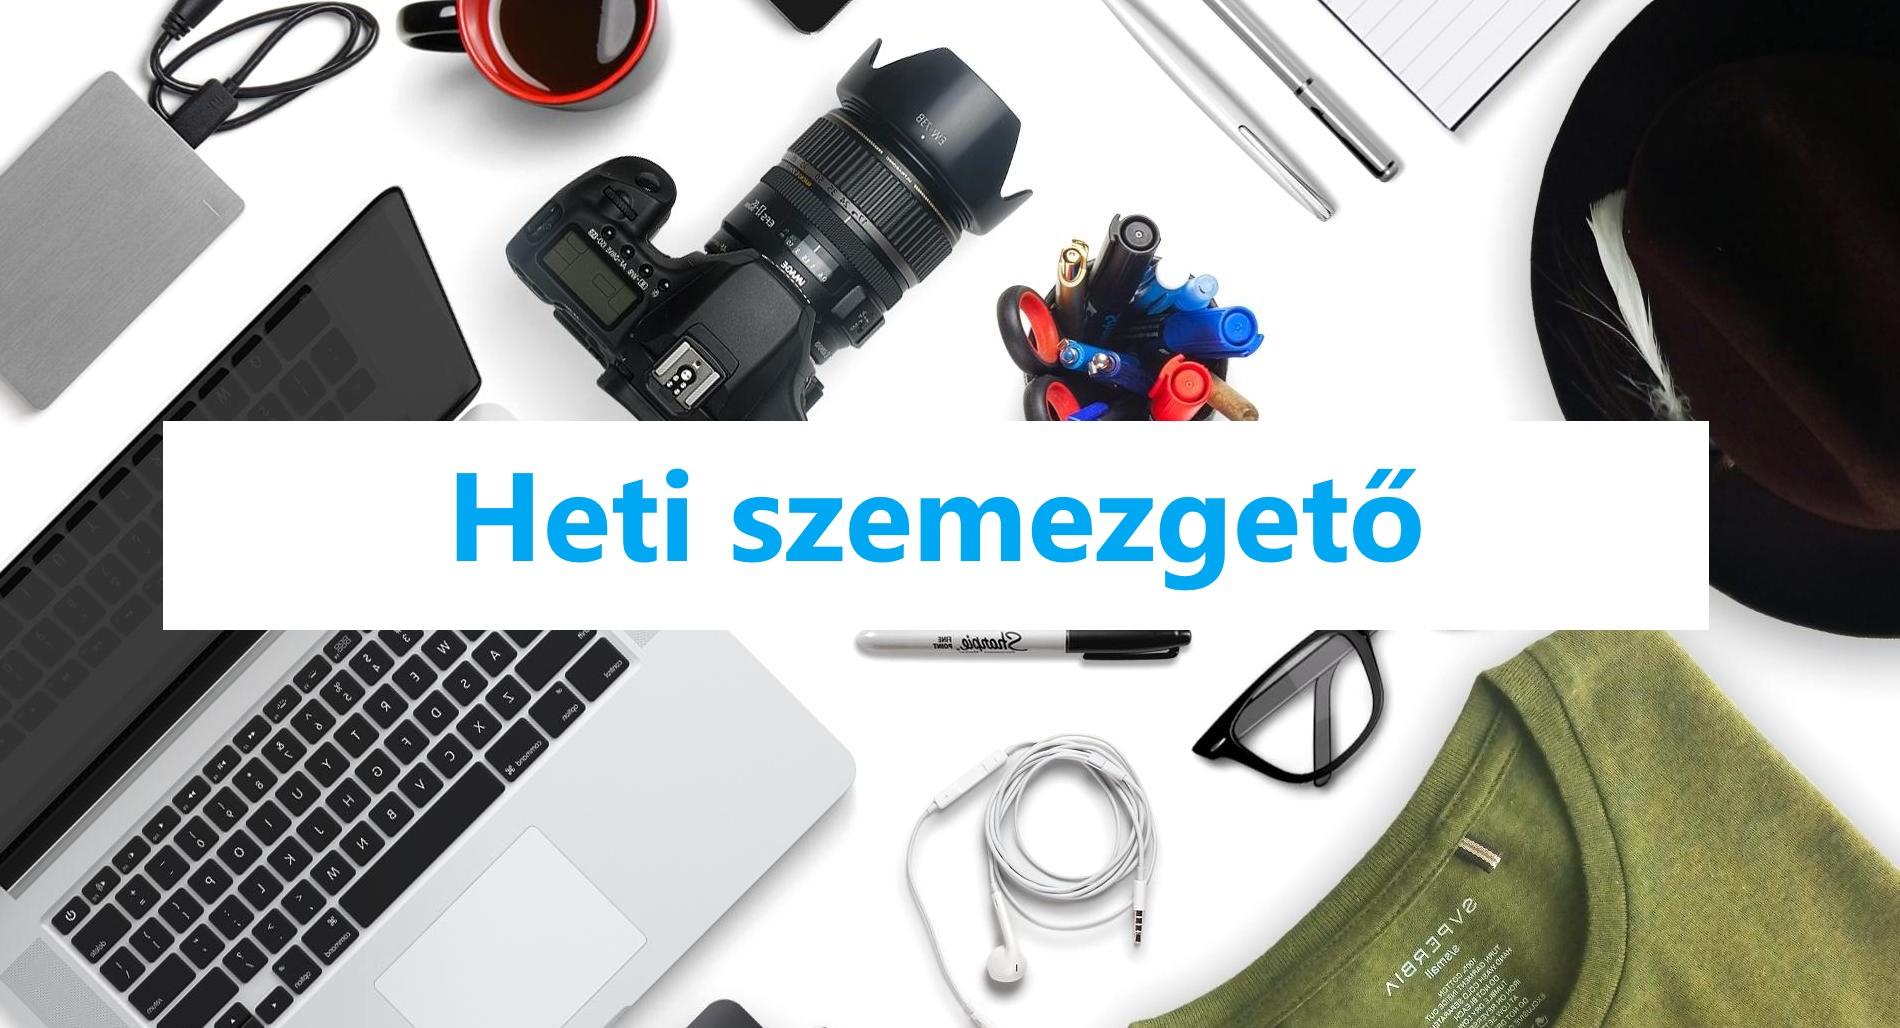 heti_szemezgeto_uj_96.jpg